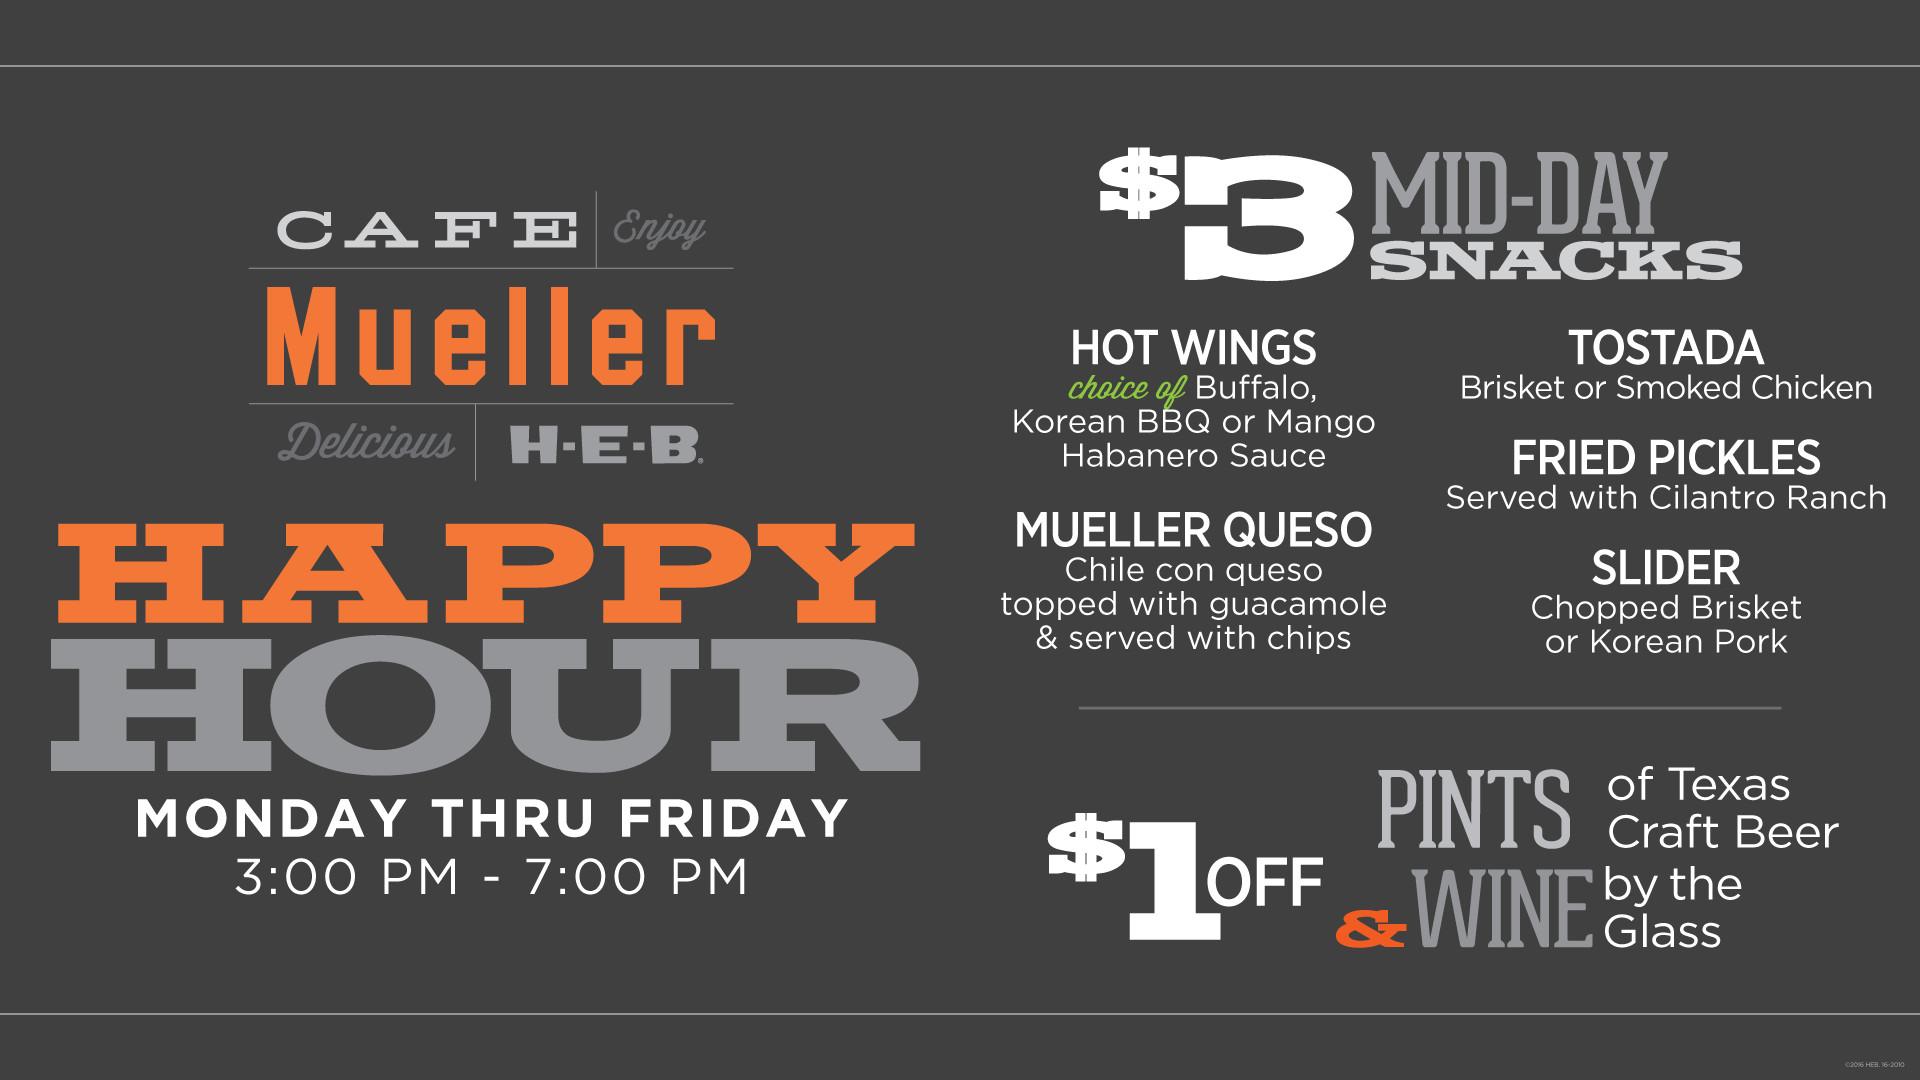 Cafe Mueller Happy Hour Menu